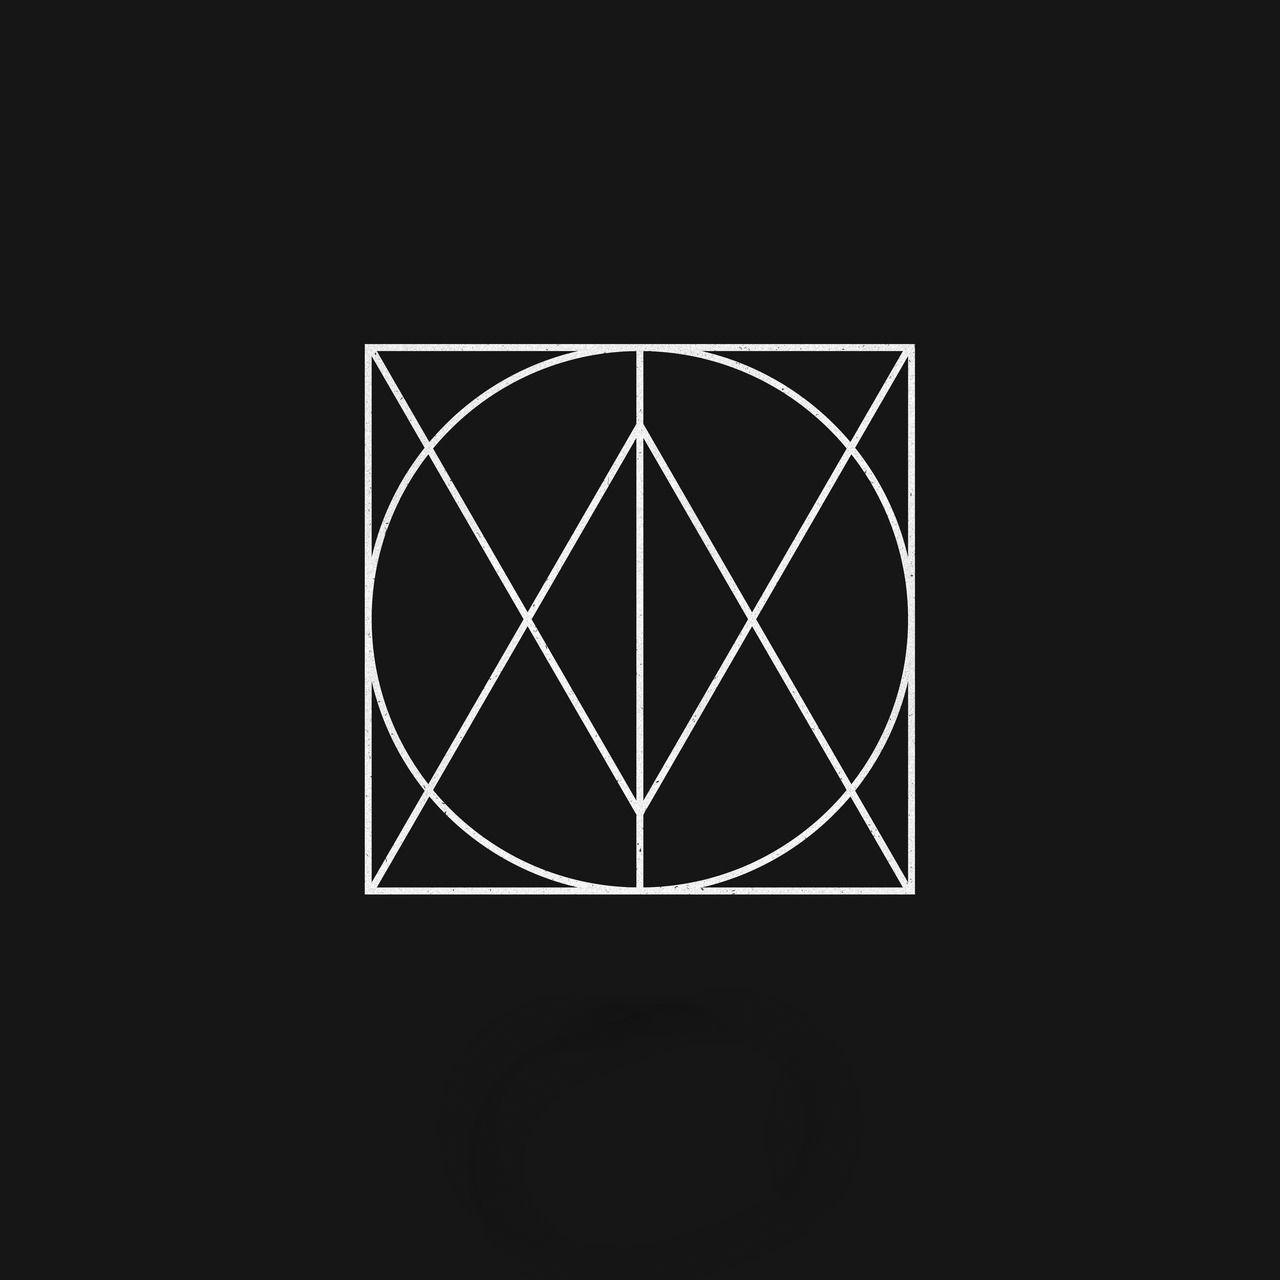 Art Of Geometry Art Abstract Minimalism Shapes Geometric Geometry Aesthetic Tattoo Inspiration Black And W Geometric Abstract Shapes Geometric Tattoo